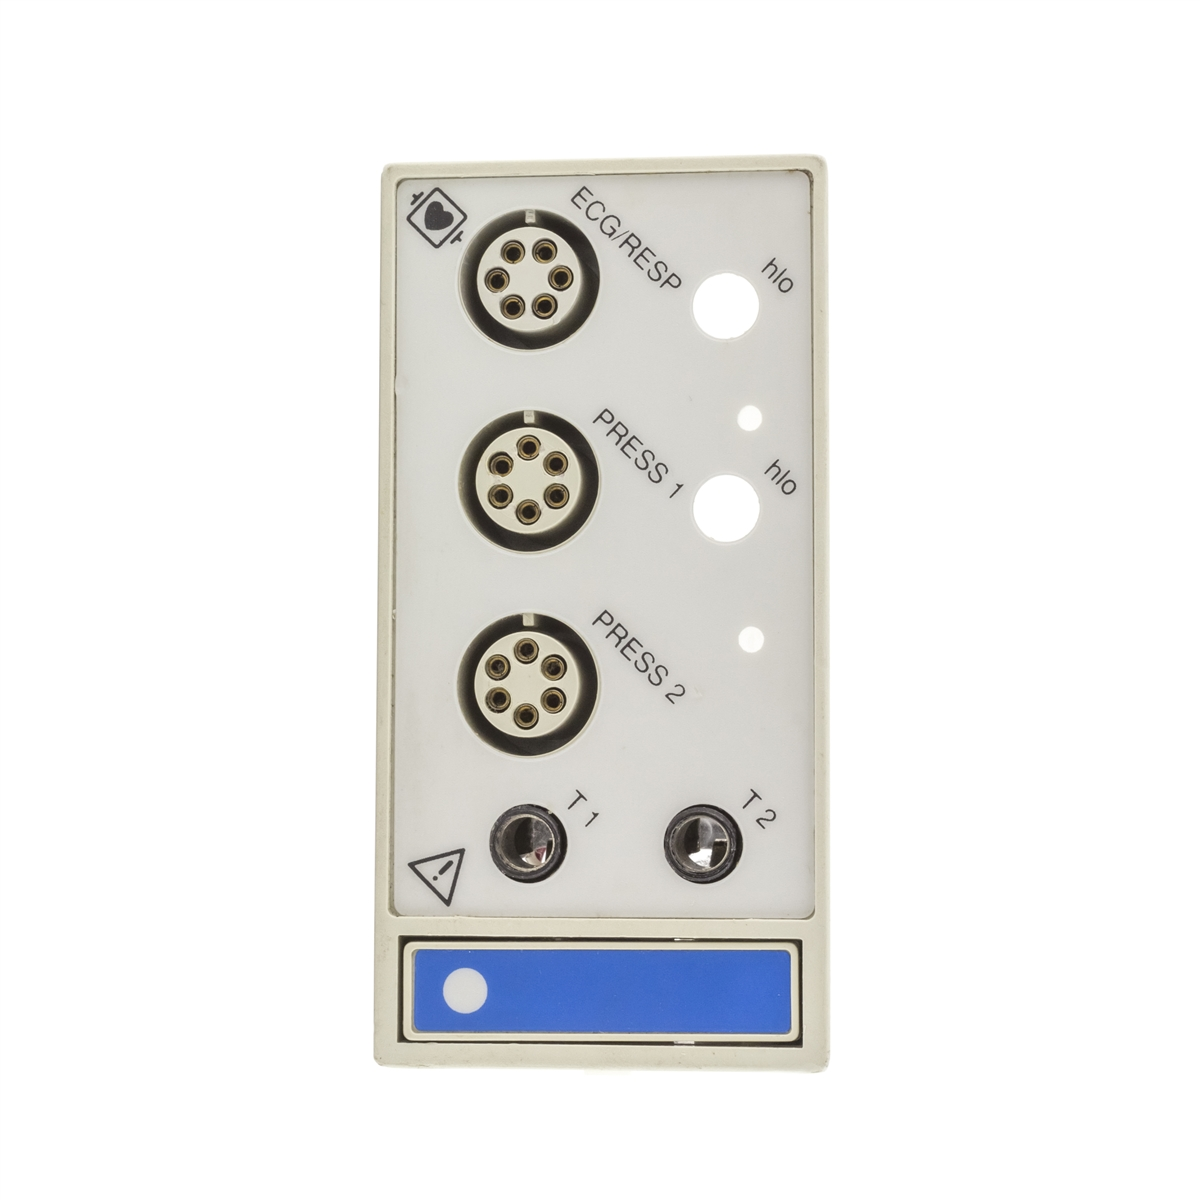 Spacelabs 90470 Multi Parameter Module Front Panel Replacement Kit